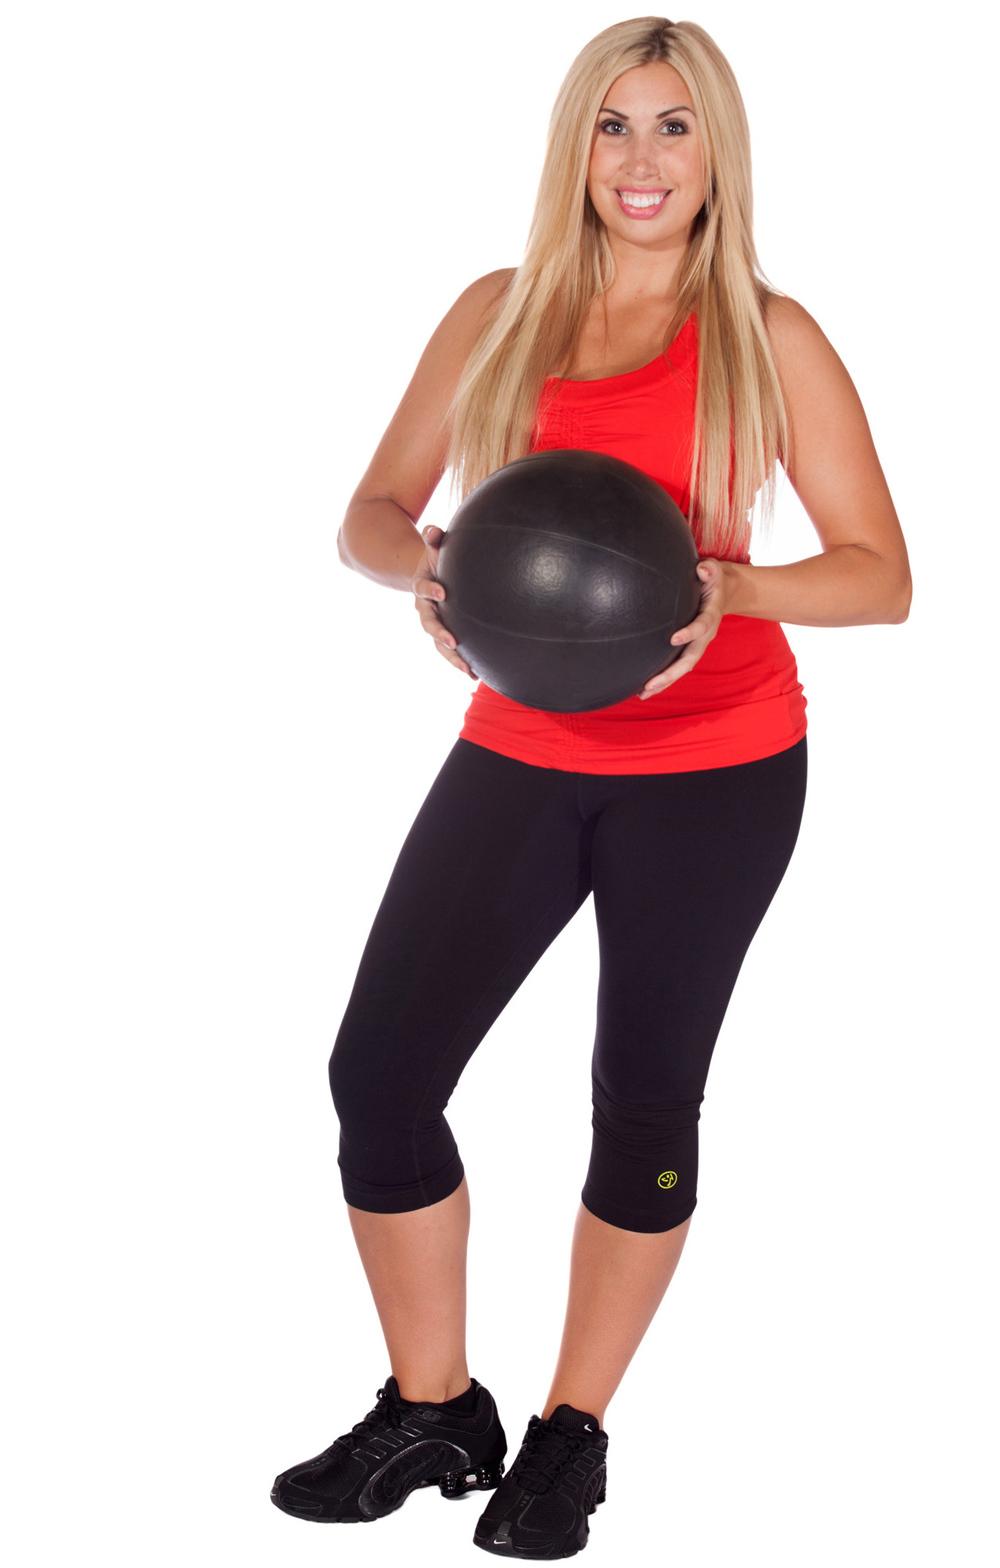 phoebe-flannagan-with-ball-40-below-fitness-center-fairbanks-ak-151-web-5.jpg